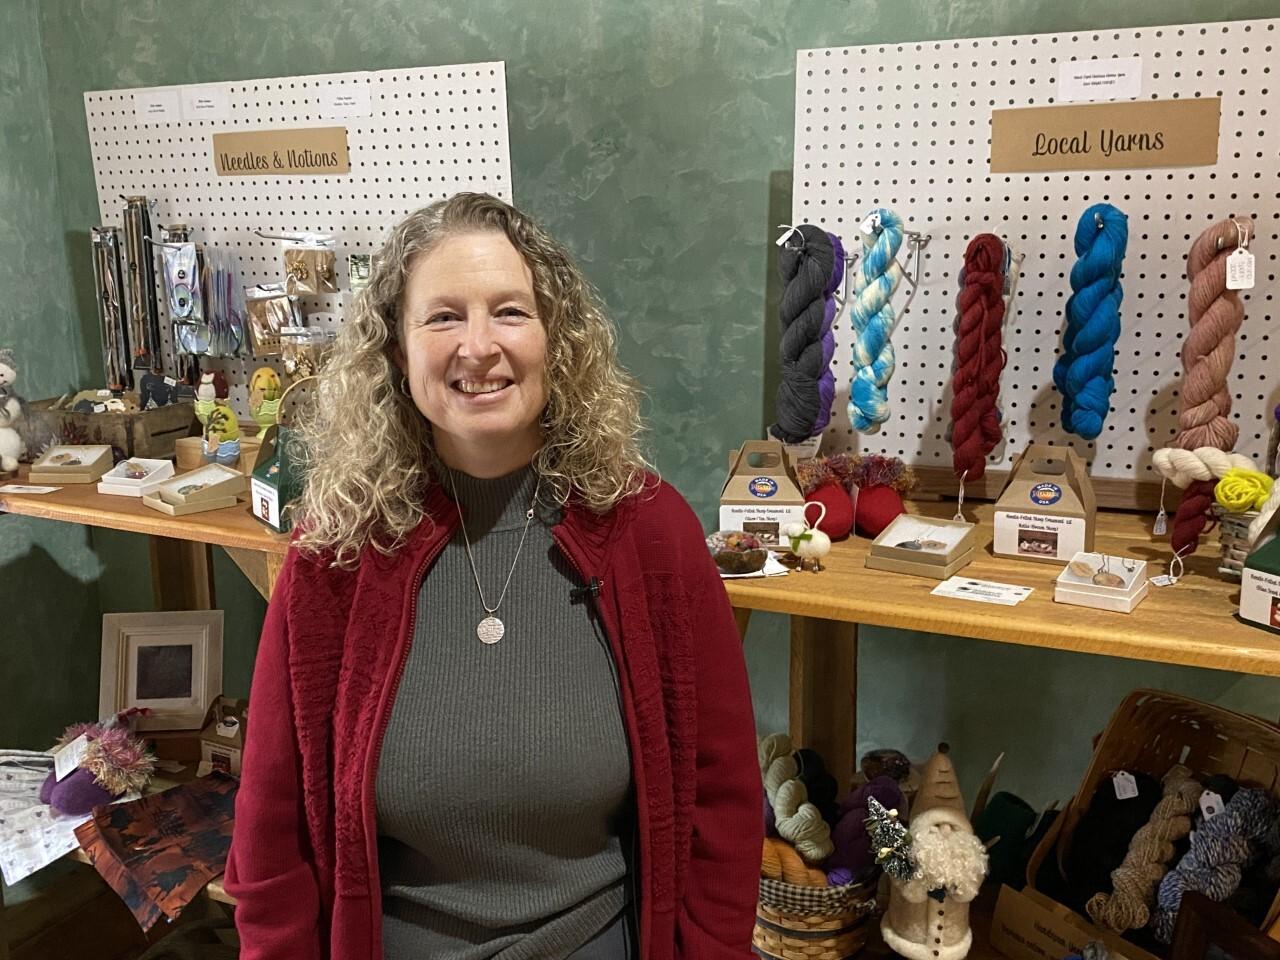 Tammy Jordan, owner of Goldieknotts Montana